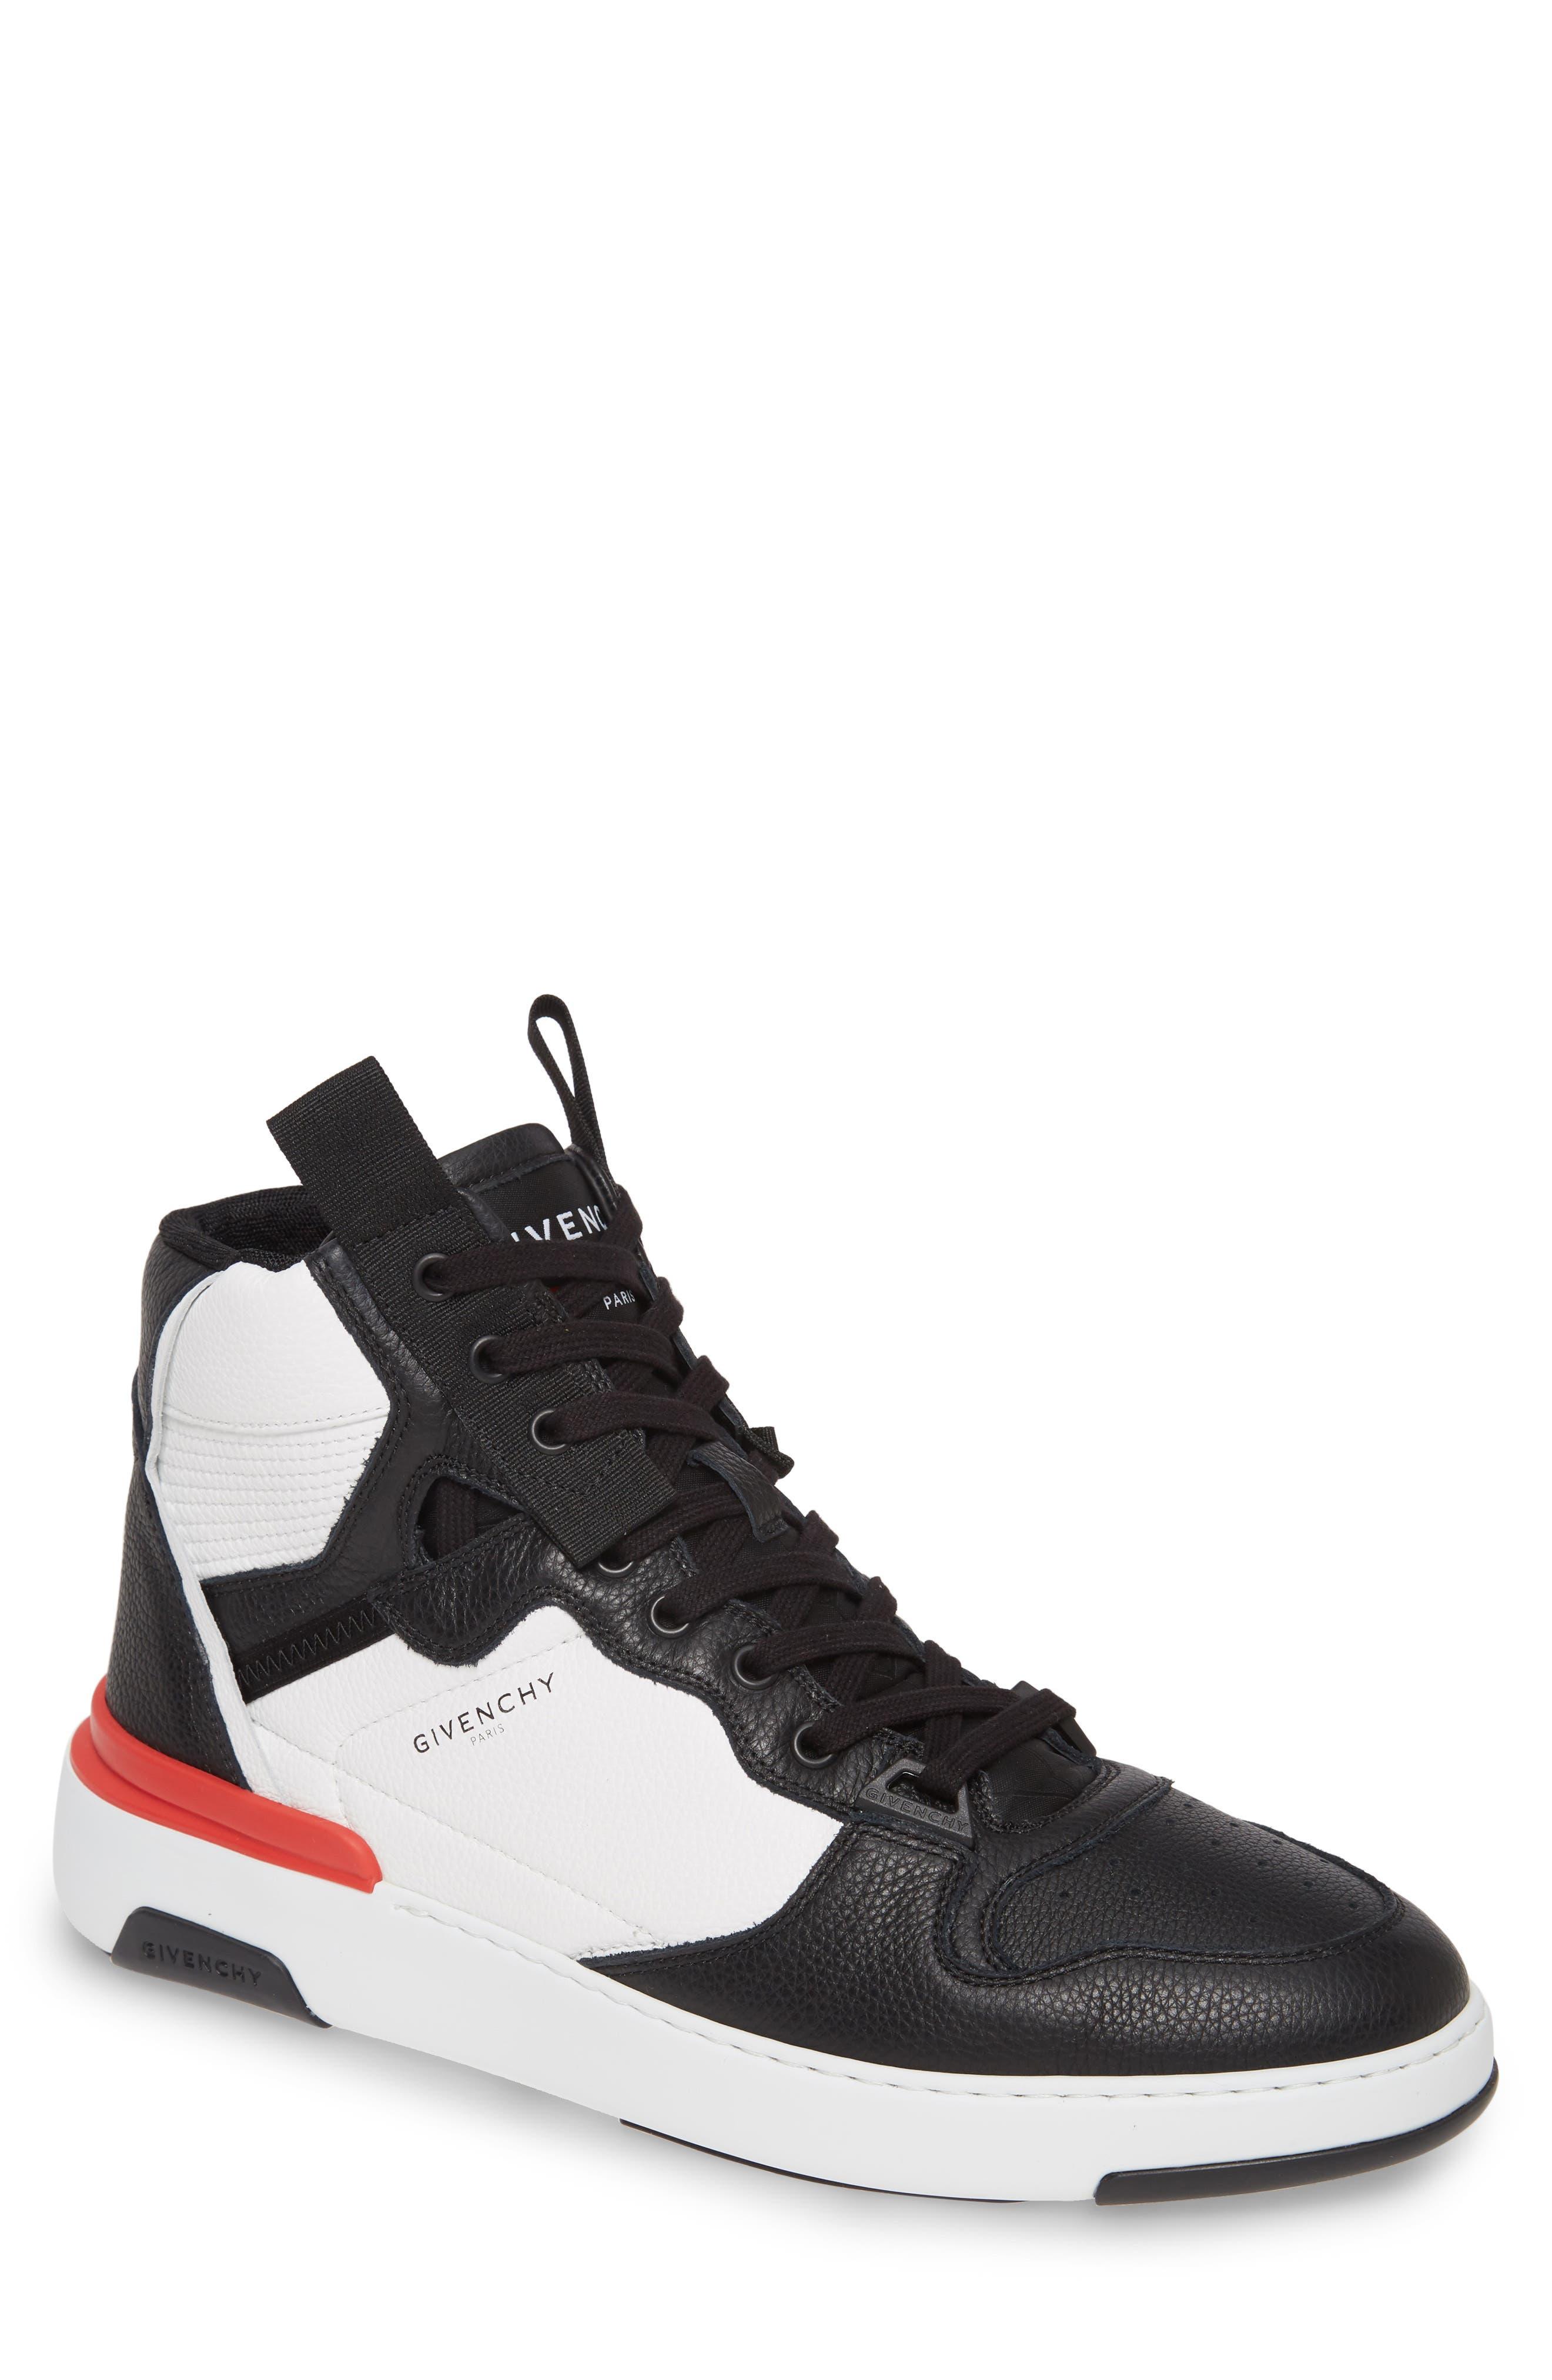 Givenchy High Top Sneaker (Men) | Nordstrom